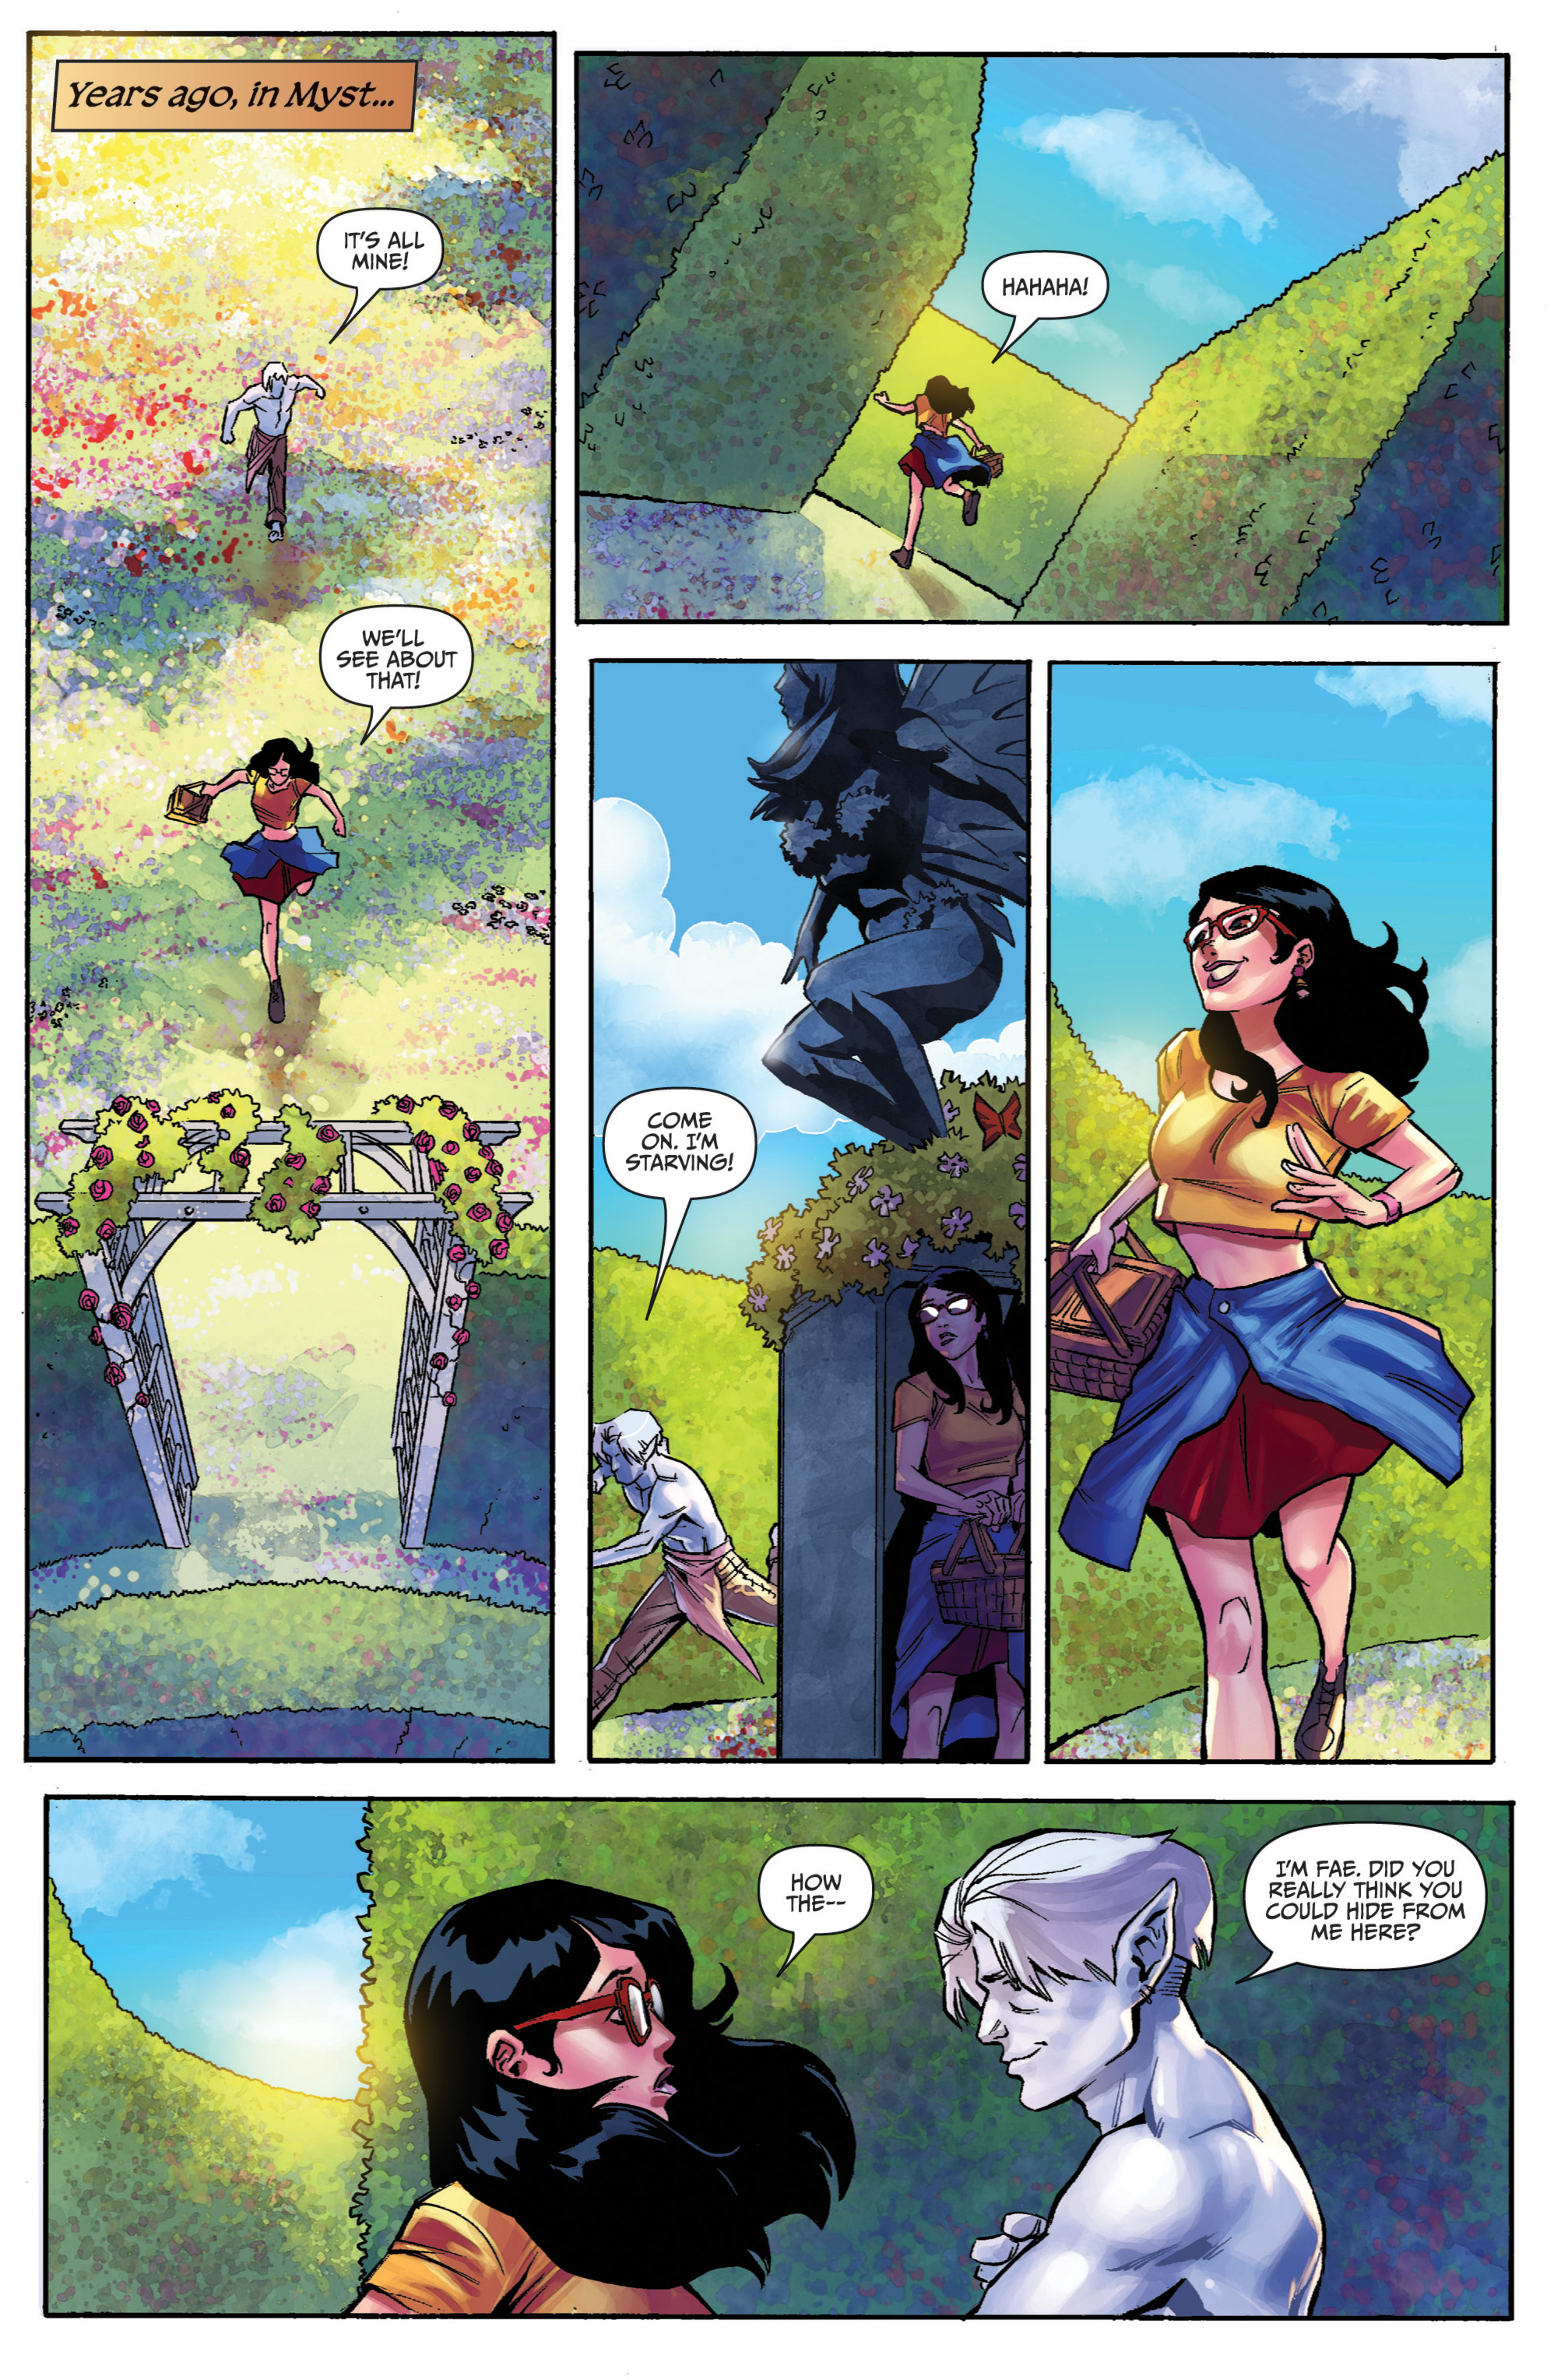 Read online Snow White vs. Snow White comic -  Issue #2 - 3